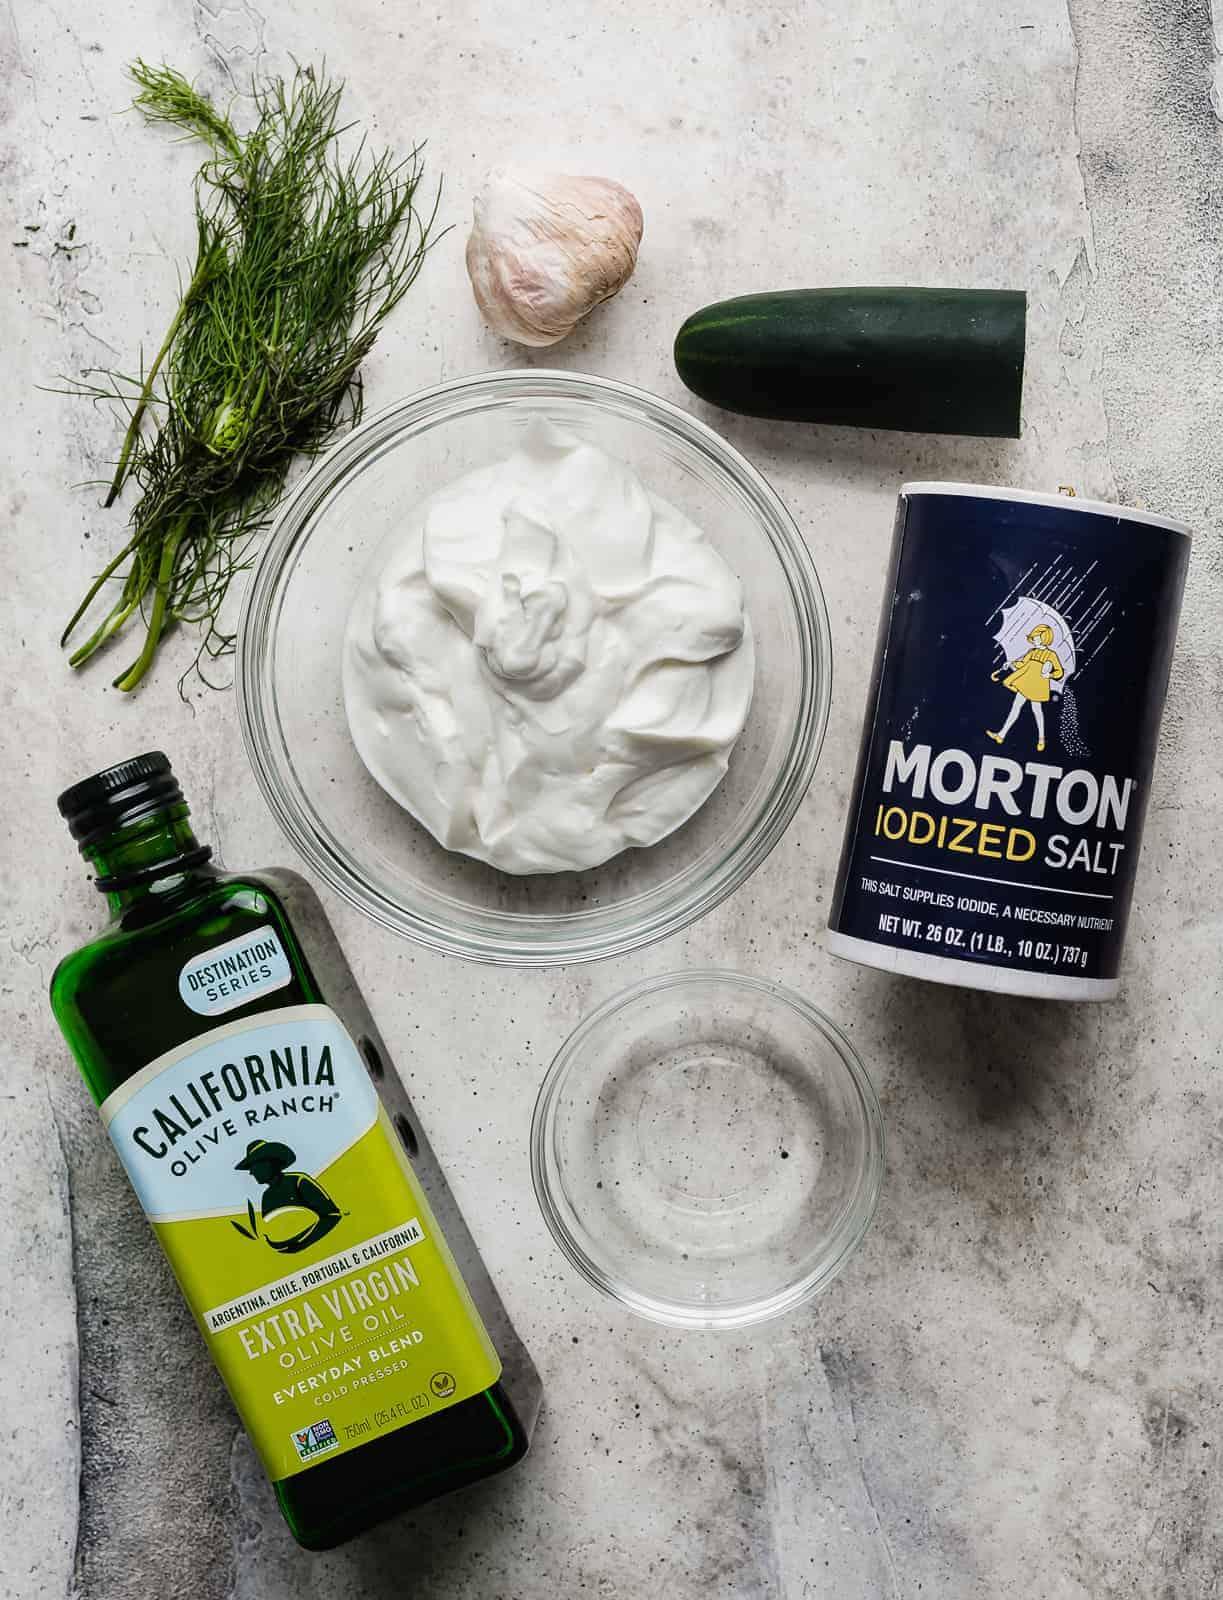 Tzatziki sauce ingredients: olive oil, dill, garlic, yogurt, salt, and cucumber on a grey background.